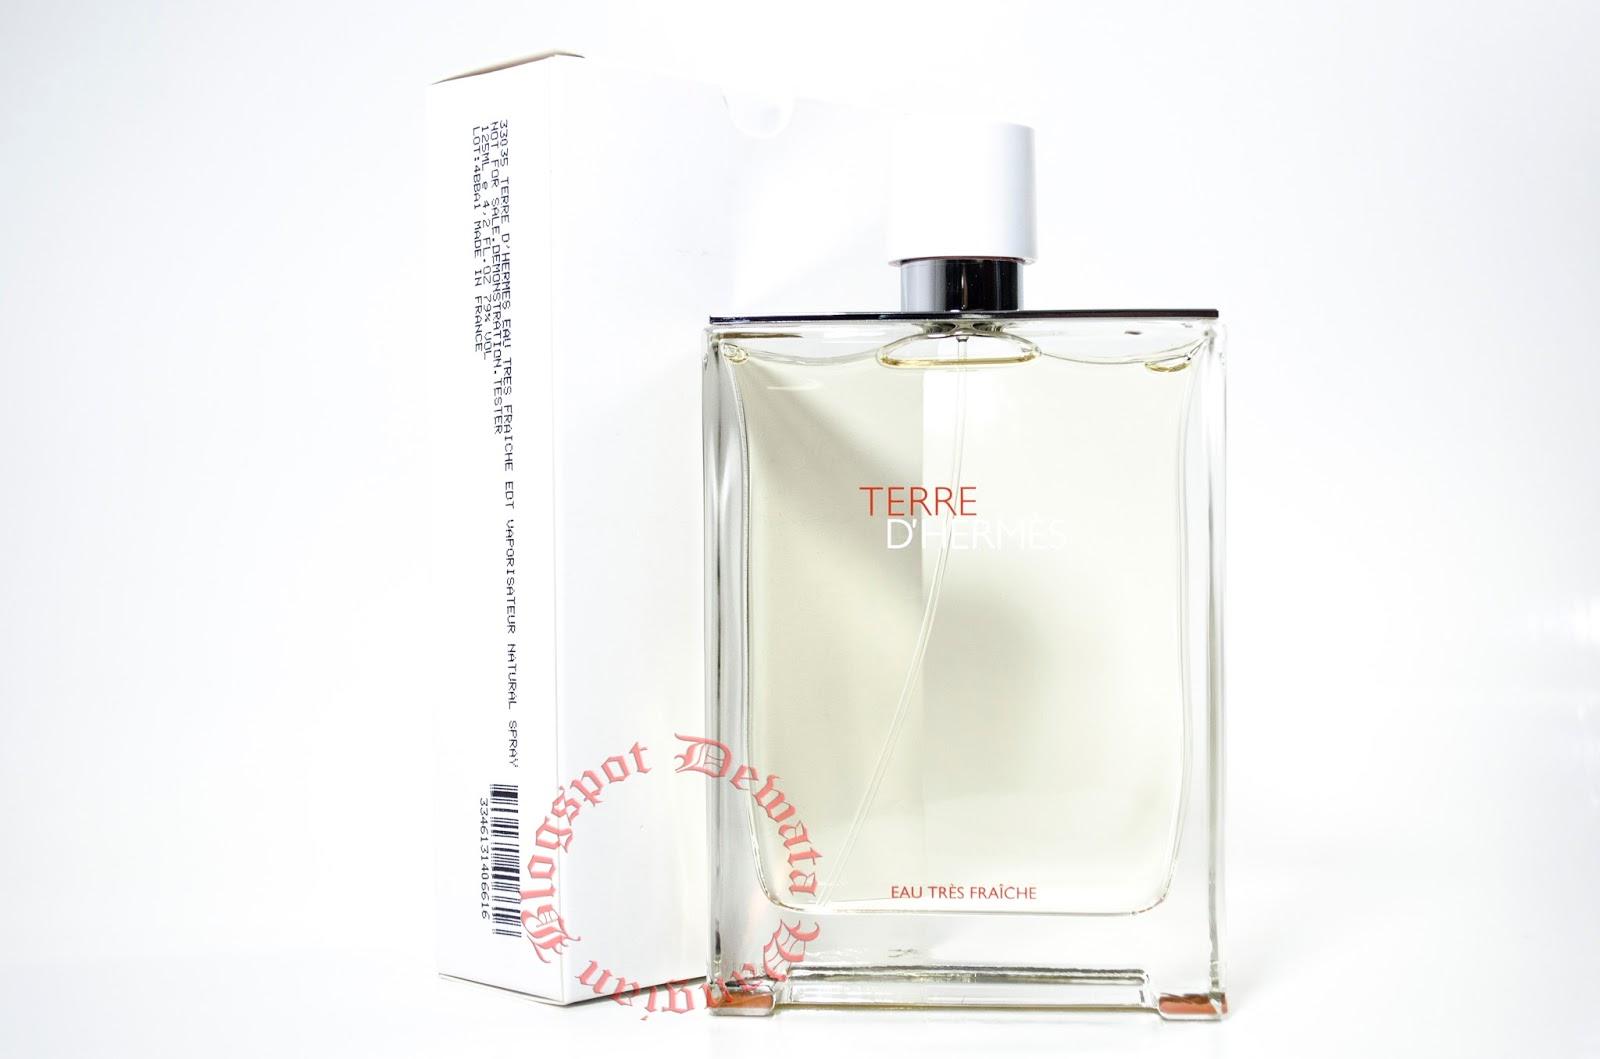 Eau Trs Fraiche Kanada Versicherung Hermes Terre D Man Flacon H 2014 Parfum 75 Ml Toilette Spray 75ml Aftershave Dherms Frache Is A Mens Fragrance By Herms The Scent